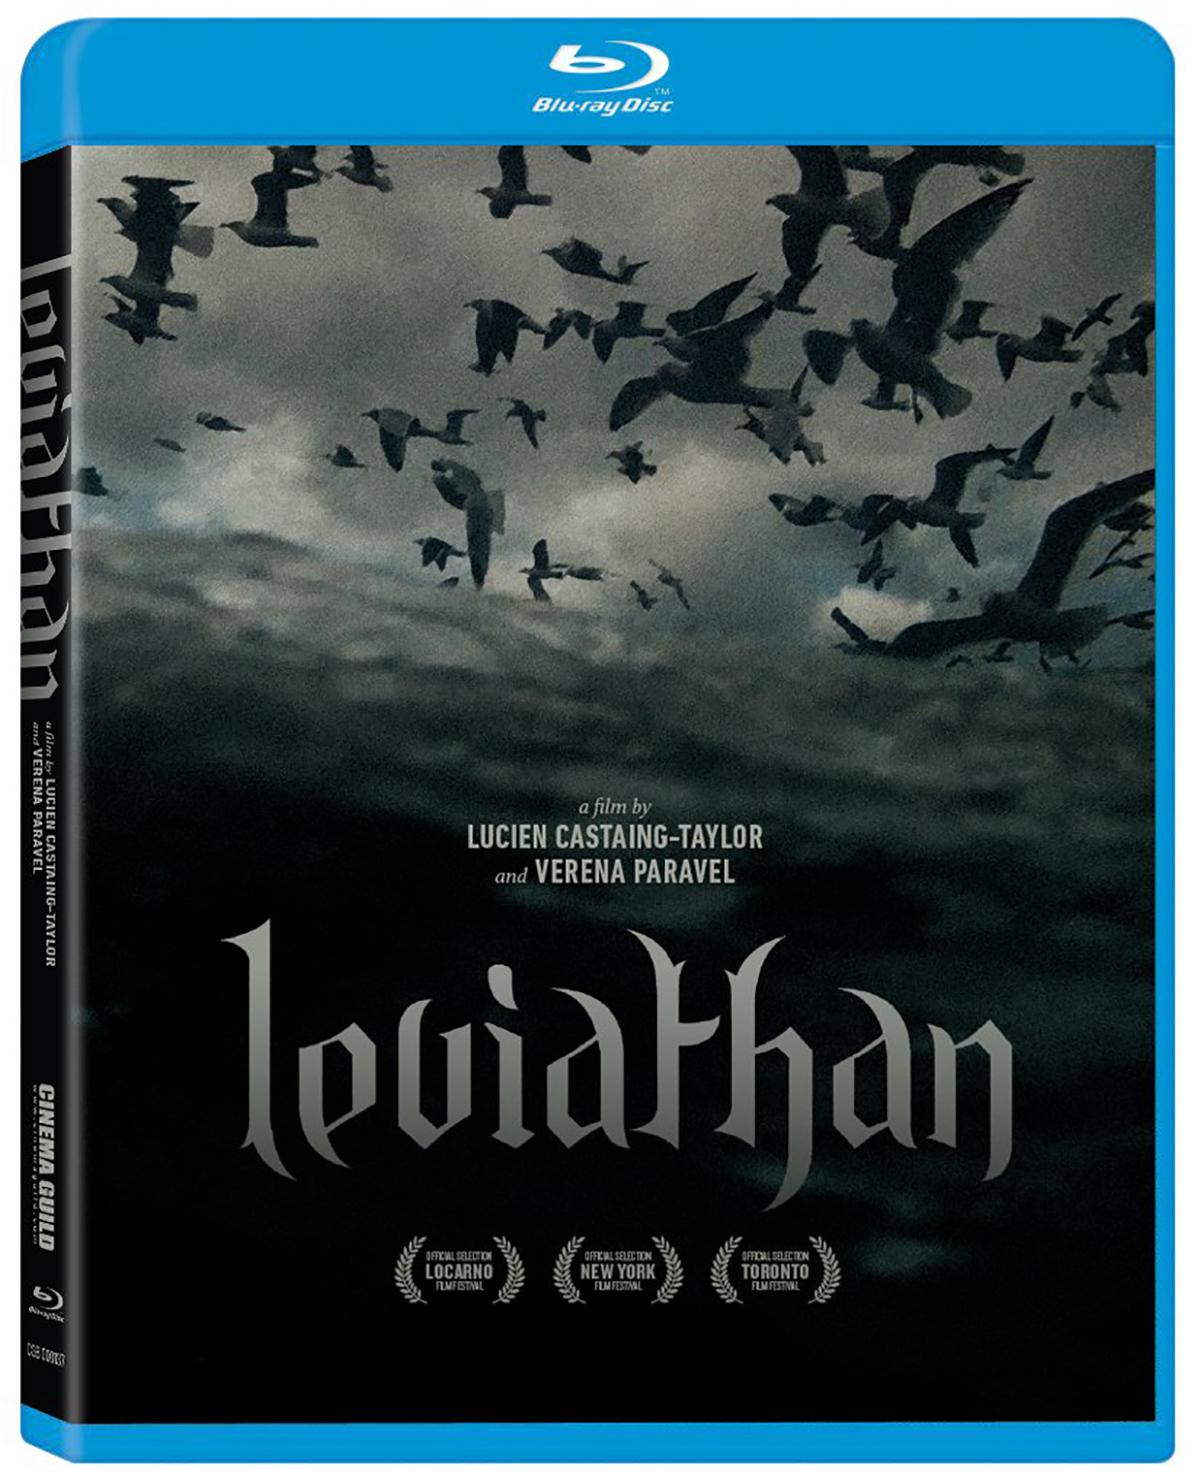 Blu-ray Review: Leviathan - Slant Magazine